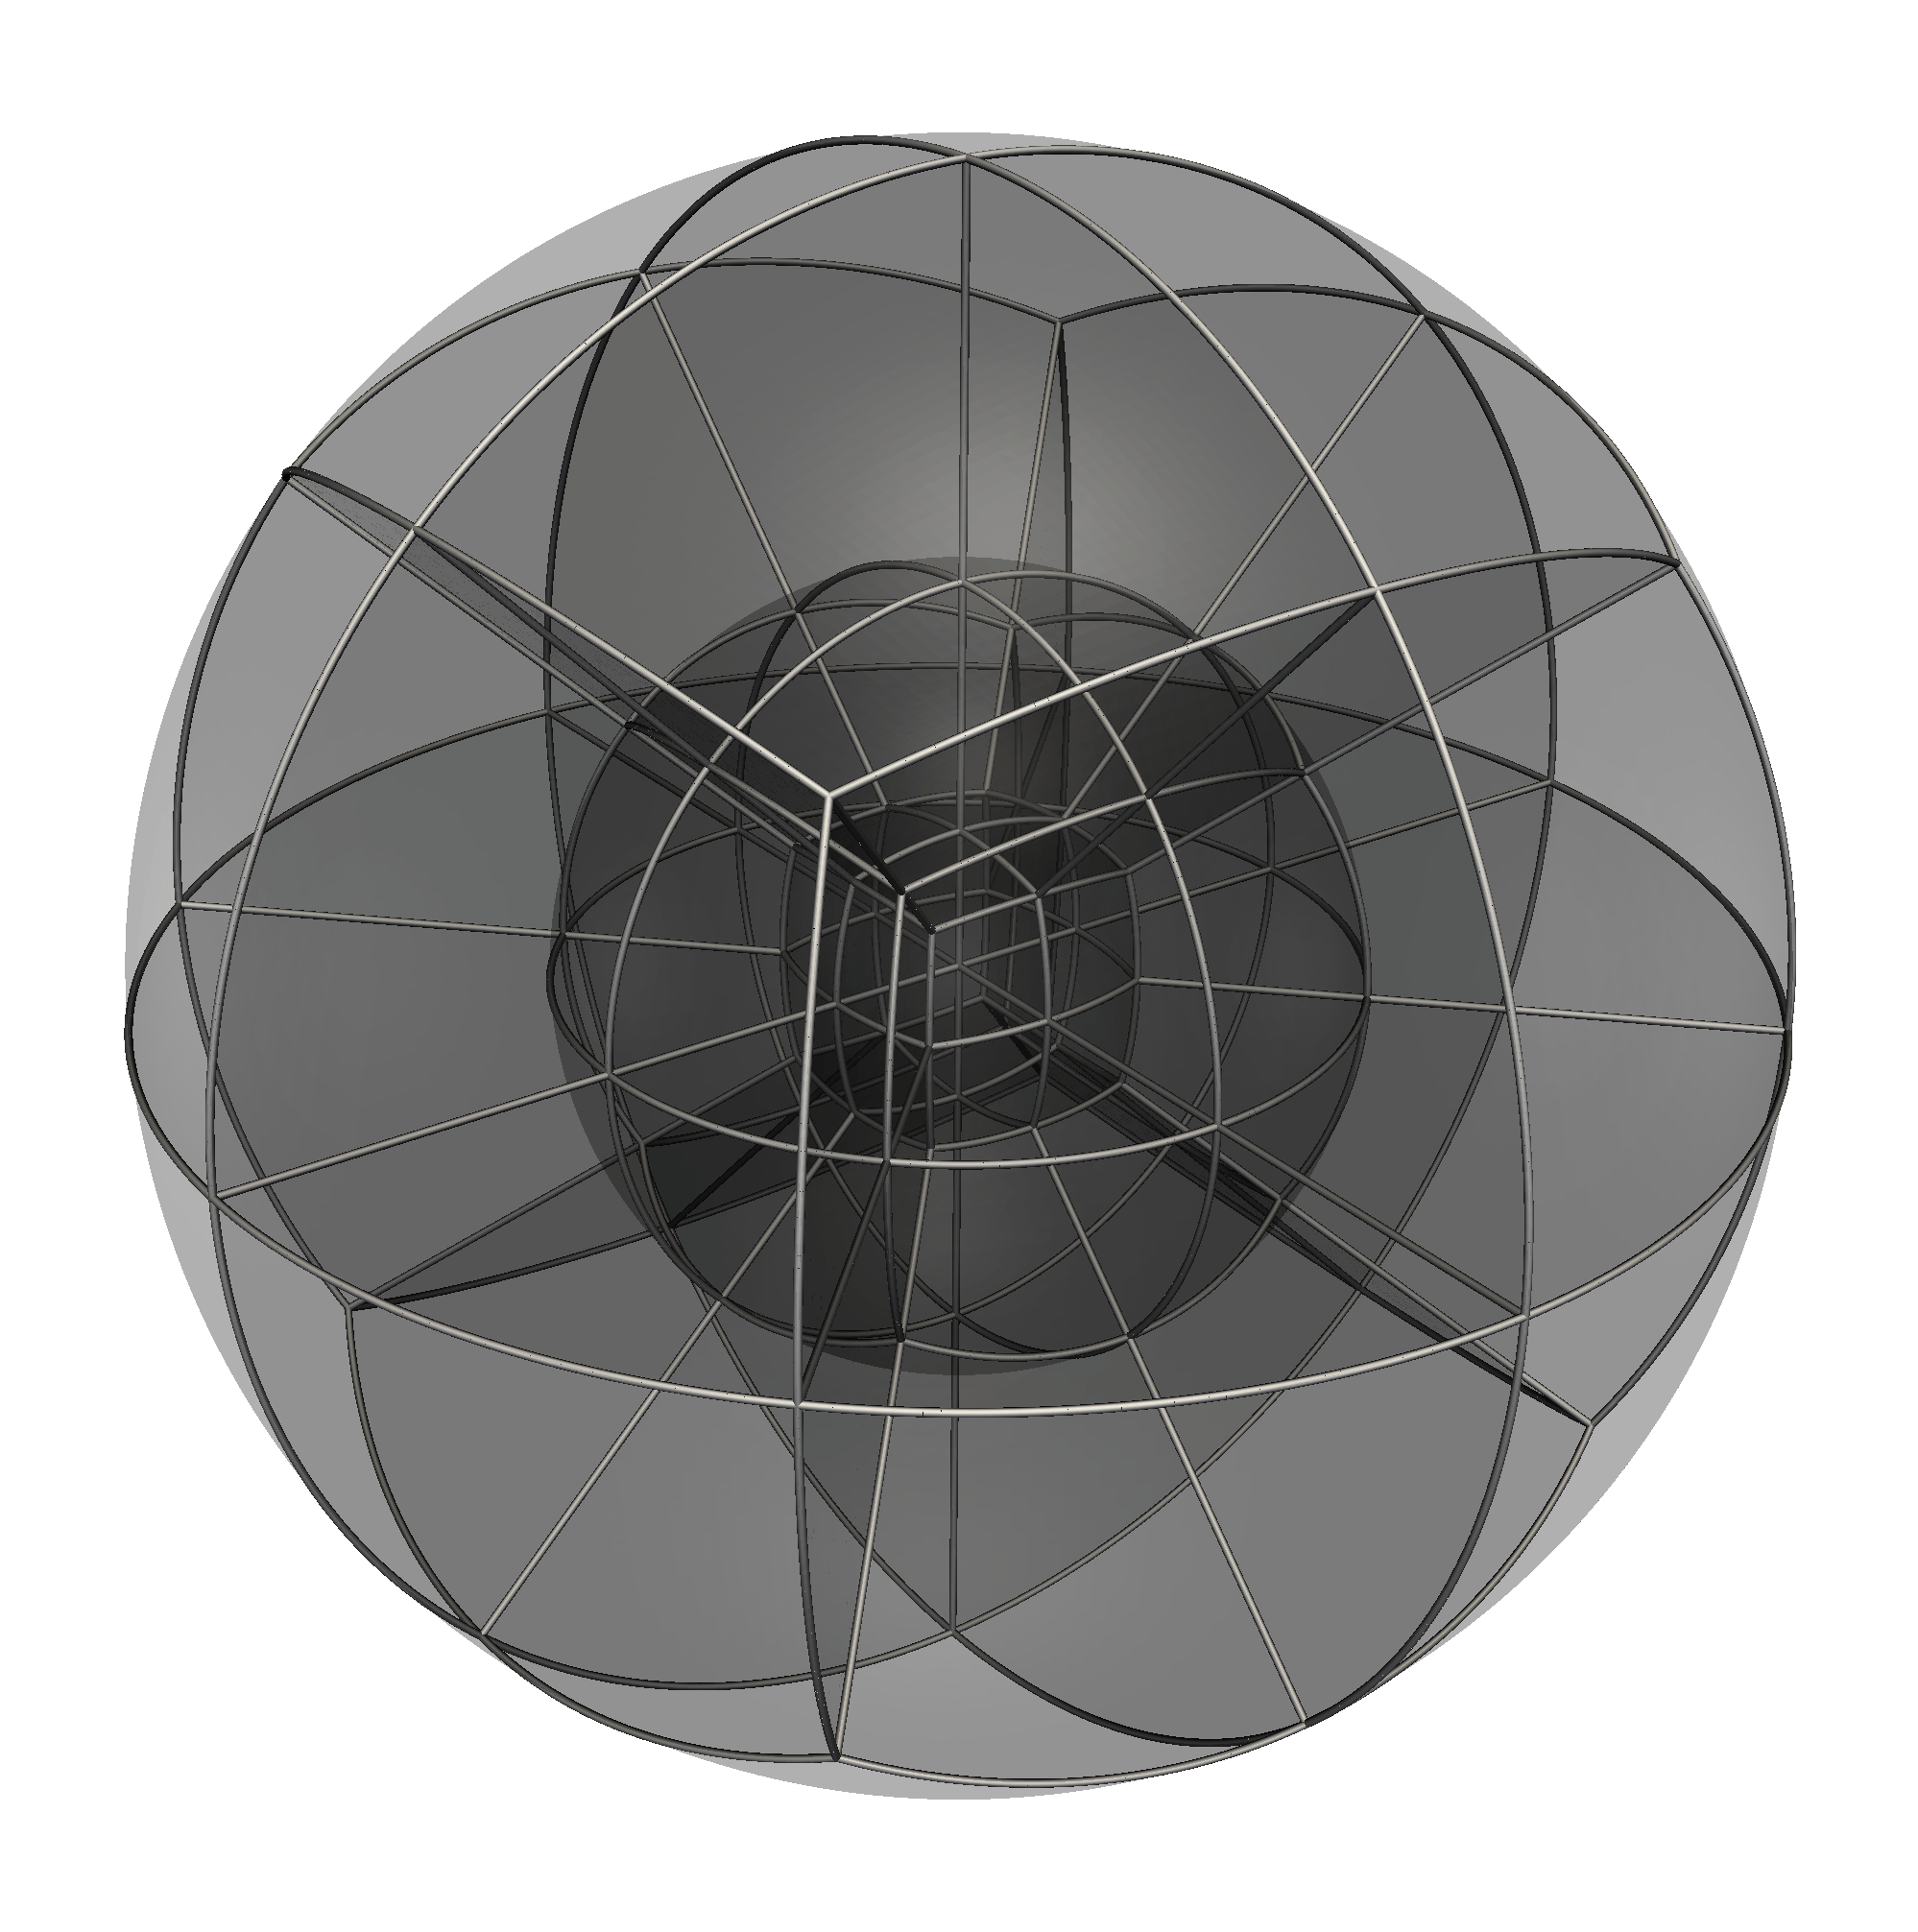 Dreidimensionales gekrümmtes Hexaedergitter